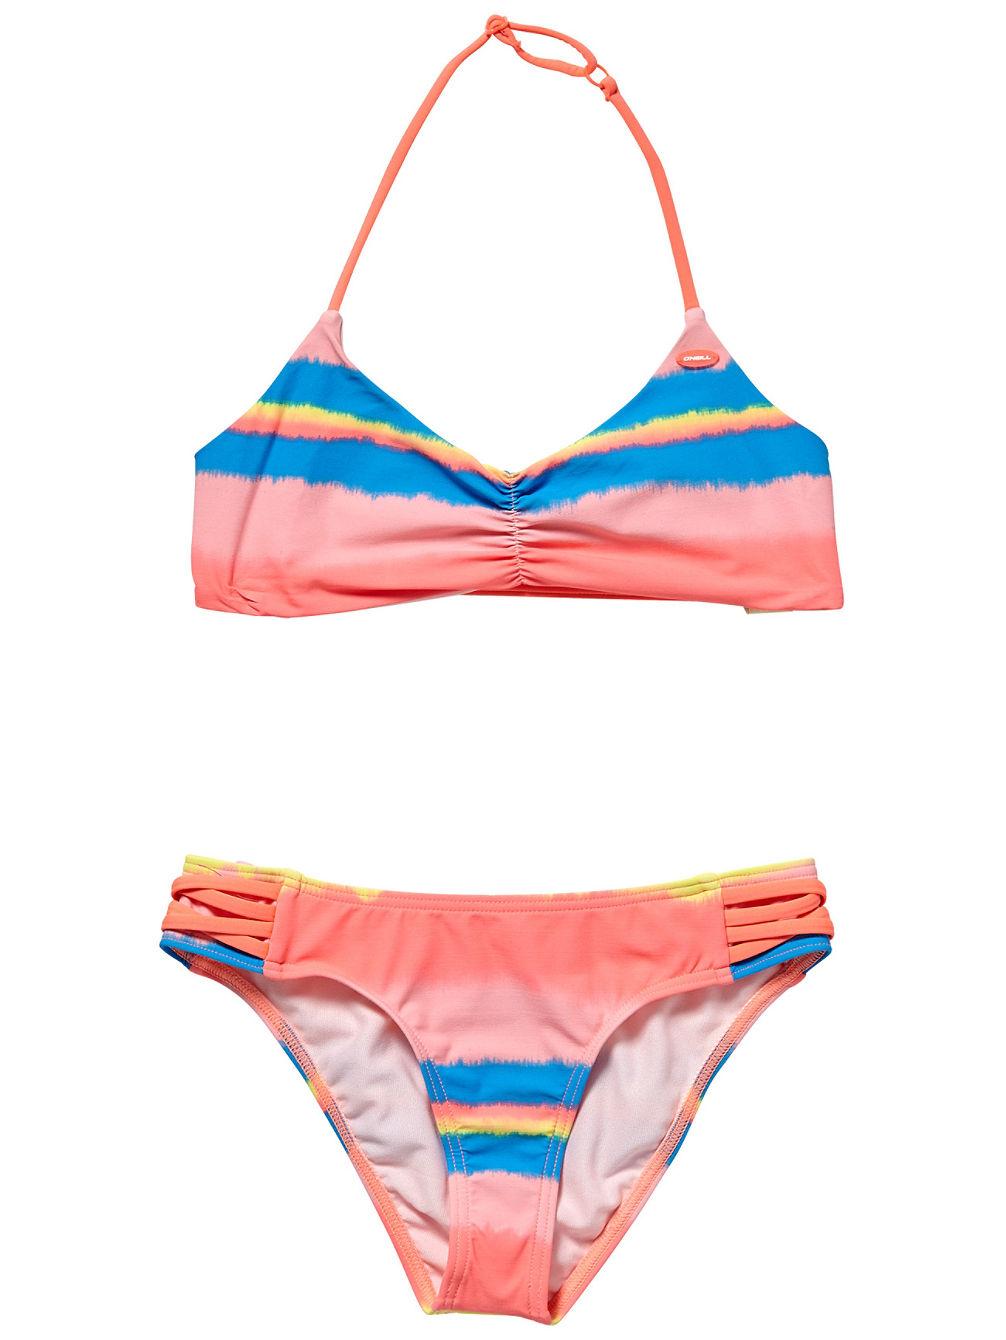 2500f61986b Buy O'Neill Boho Bikini Girls online at blue-tomato.com